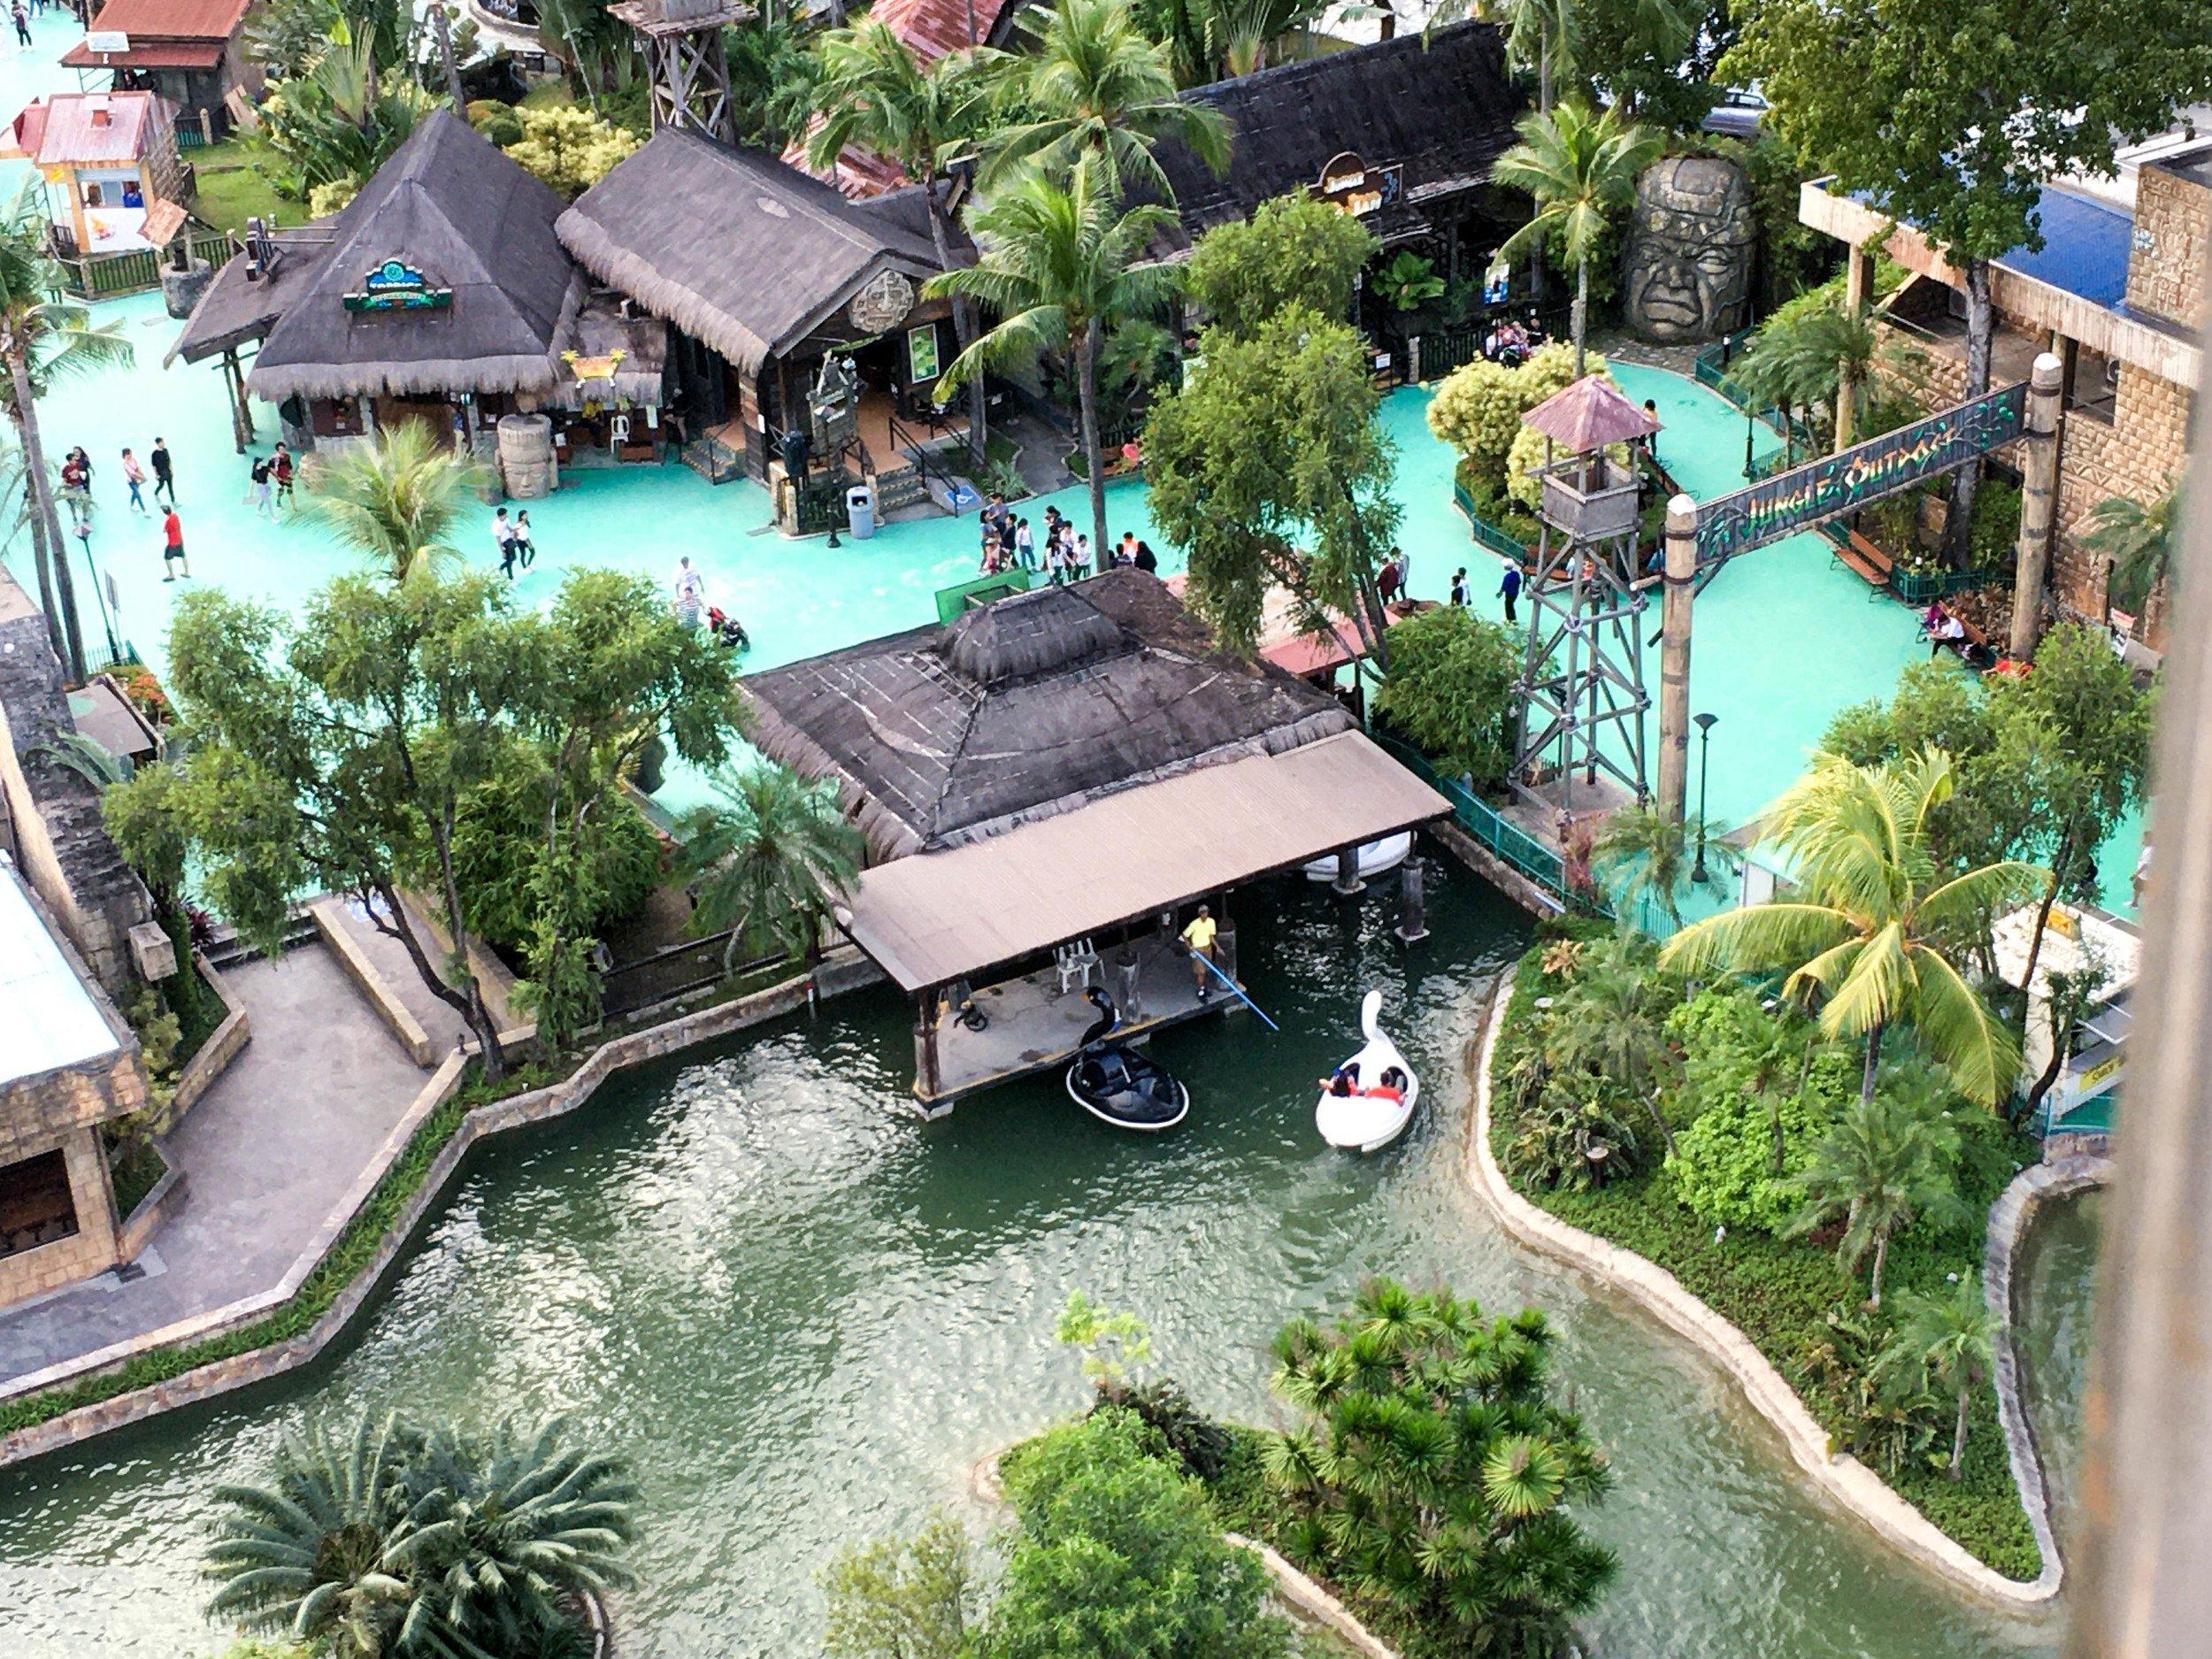 10 Reasons to Love Enchanted Kingdom in Laguna, Philippines